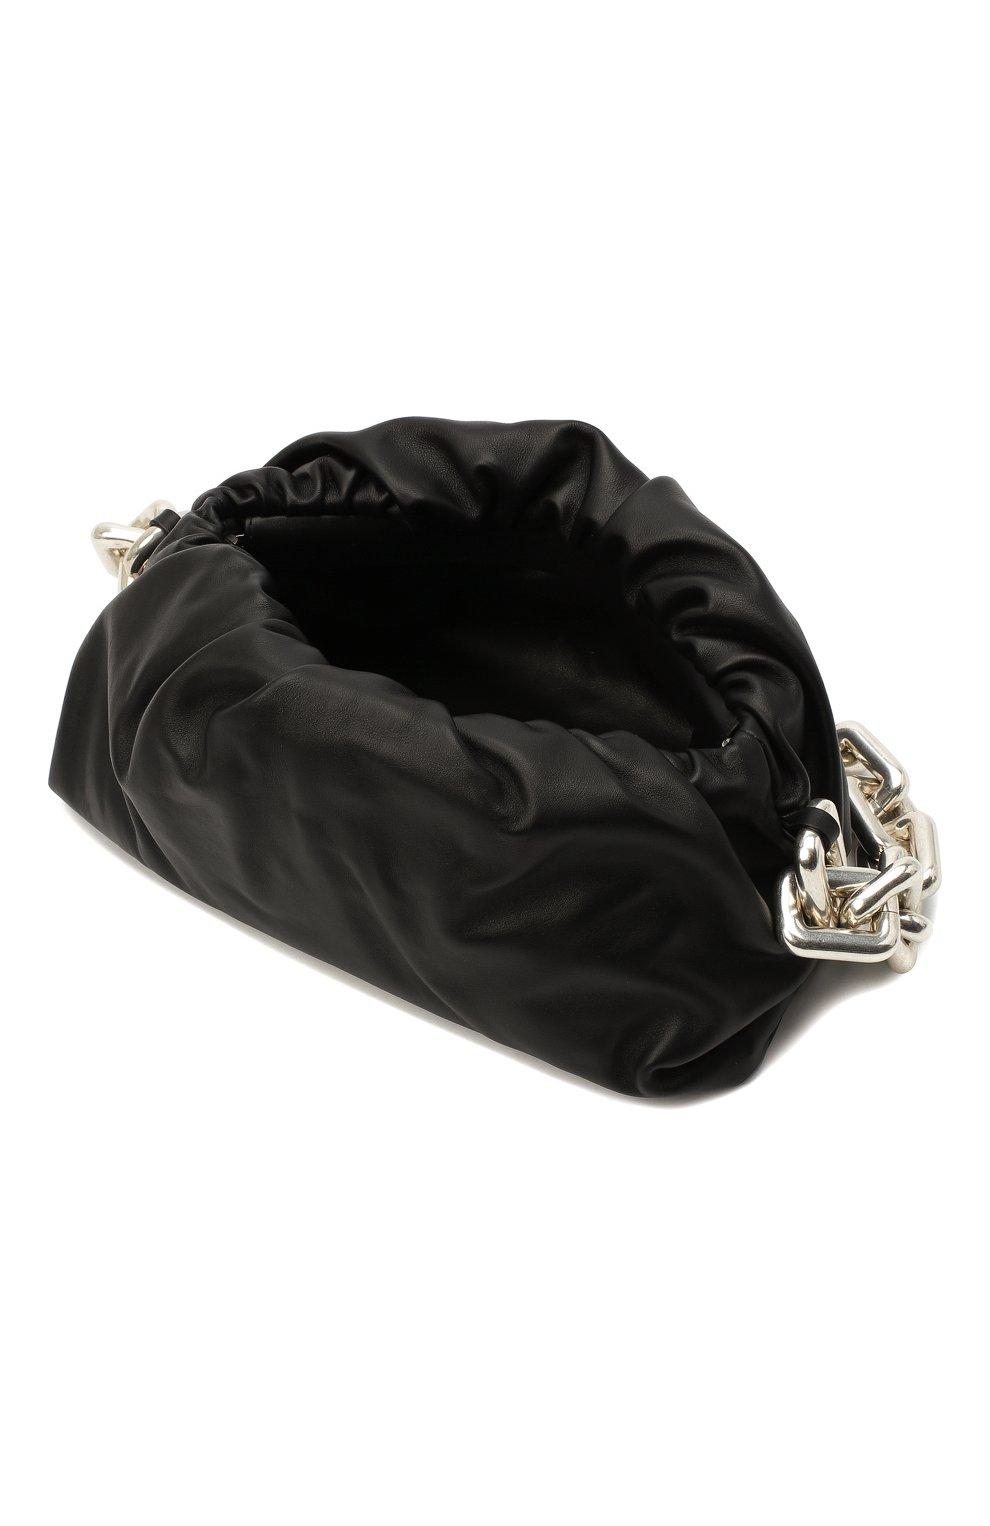 Женская сумка chain pouch BOTTEGA VENETA черного цвета, арт. 620230/VCP40 | Фото 5